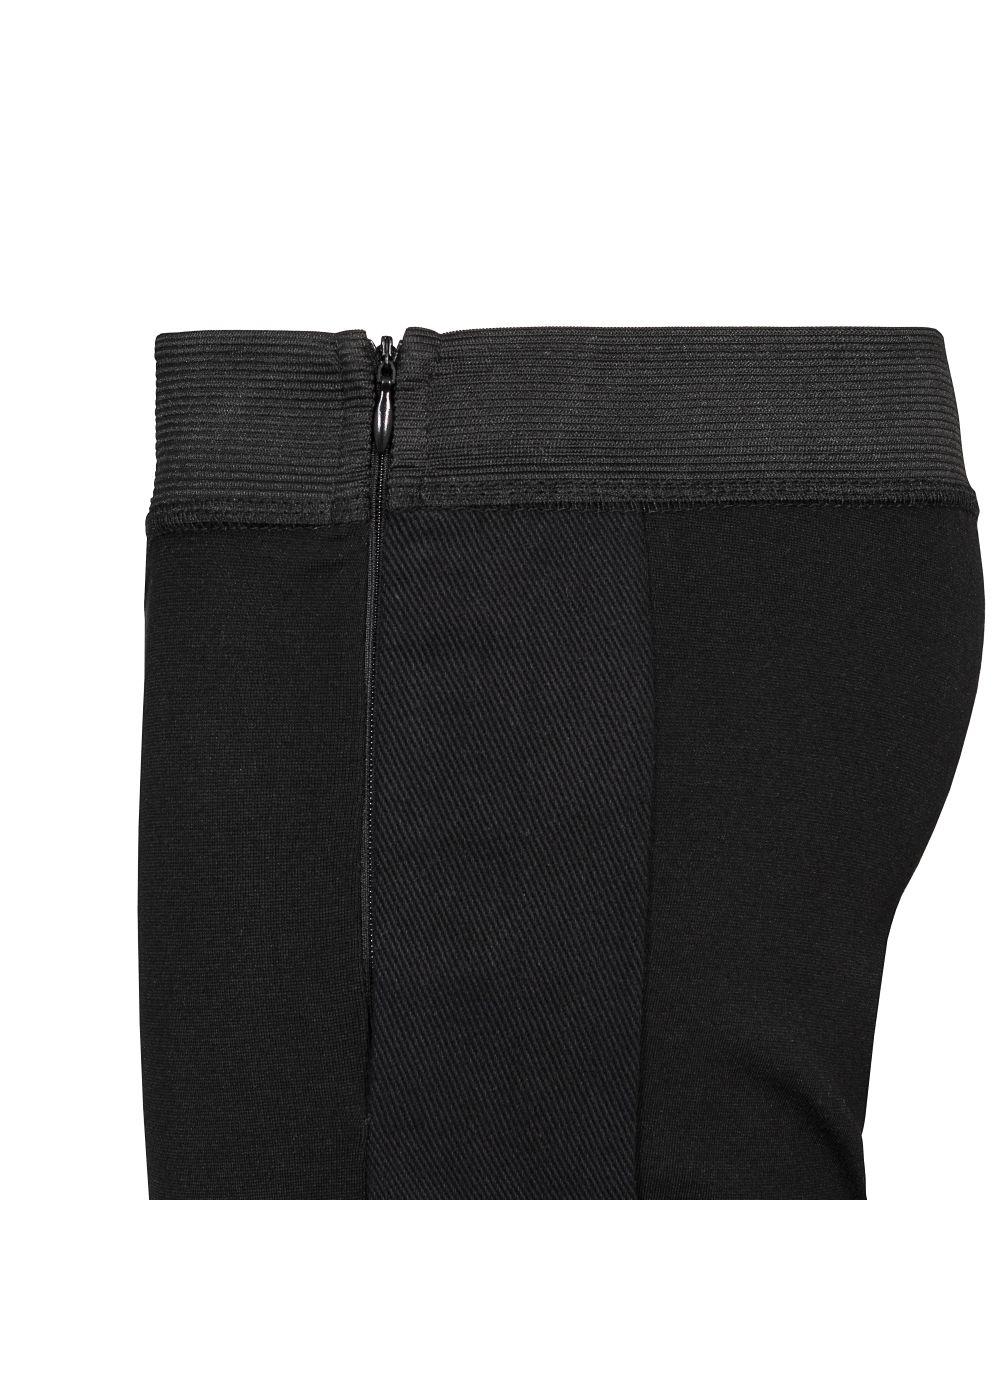 Spodnie damskie SPODT-0022-99(Z19)